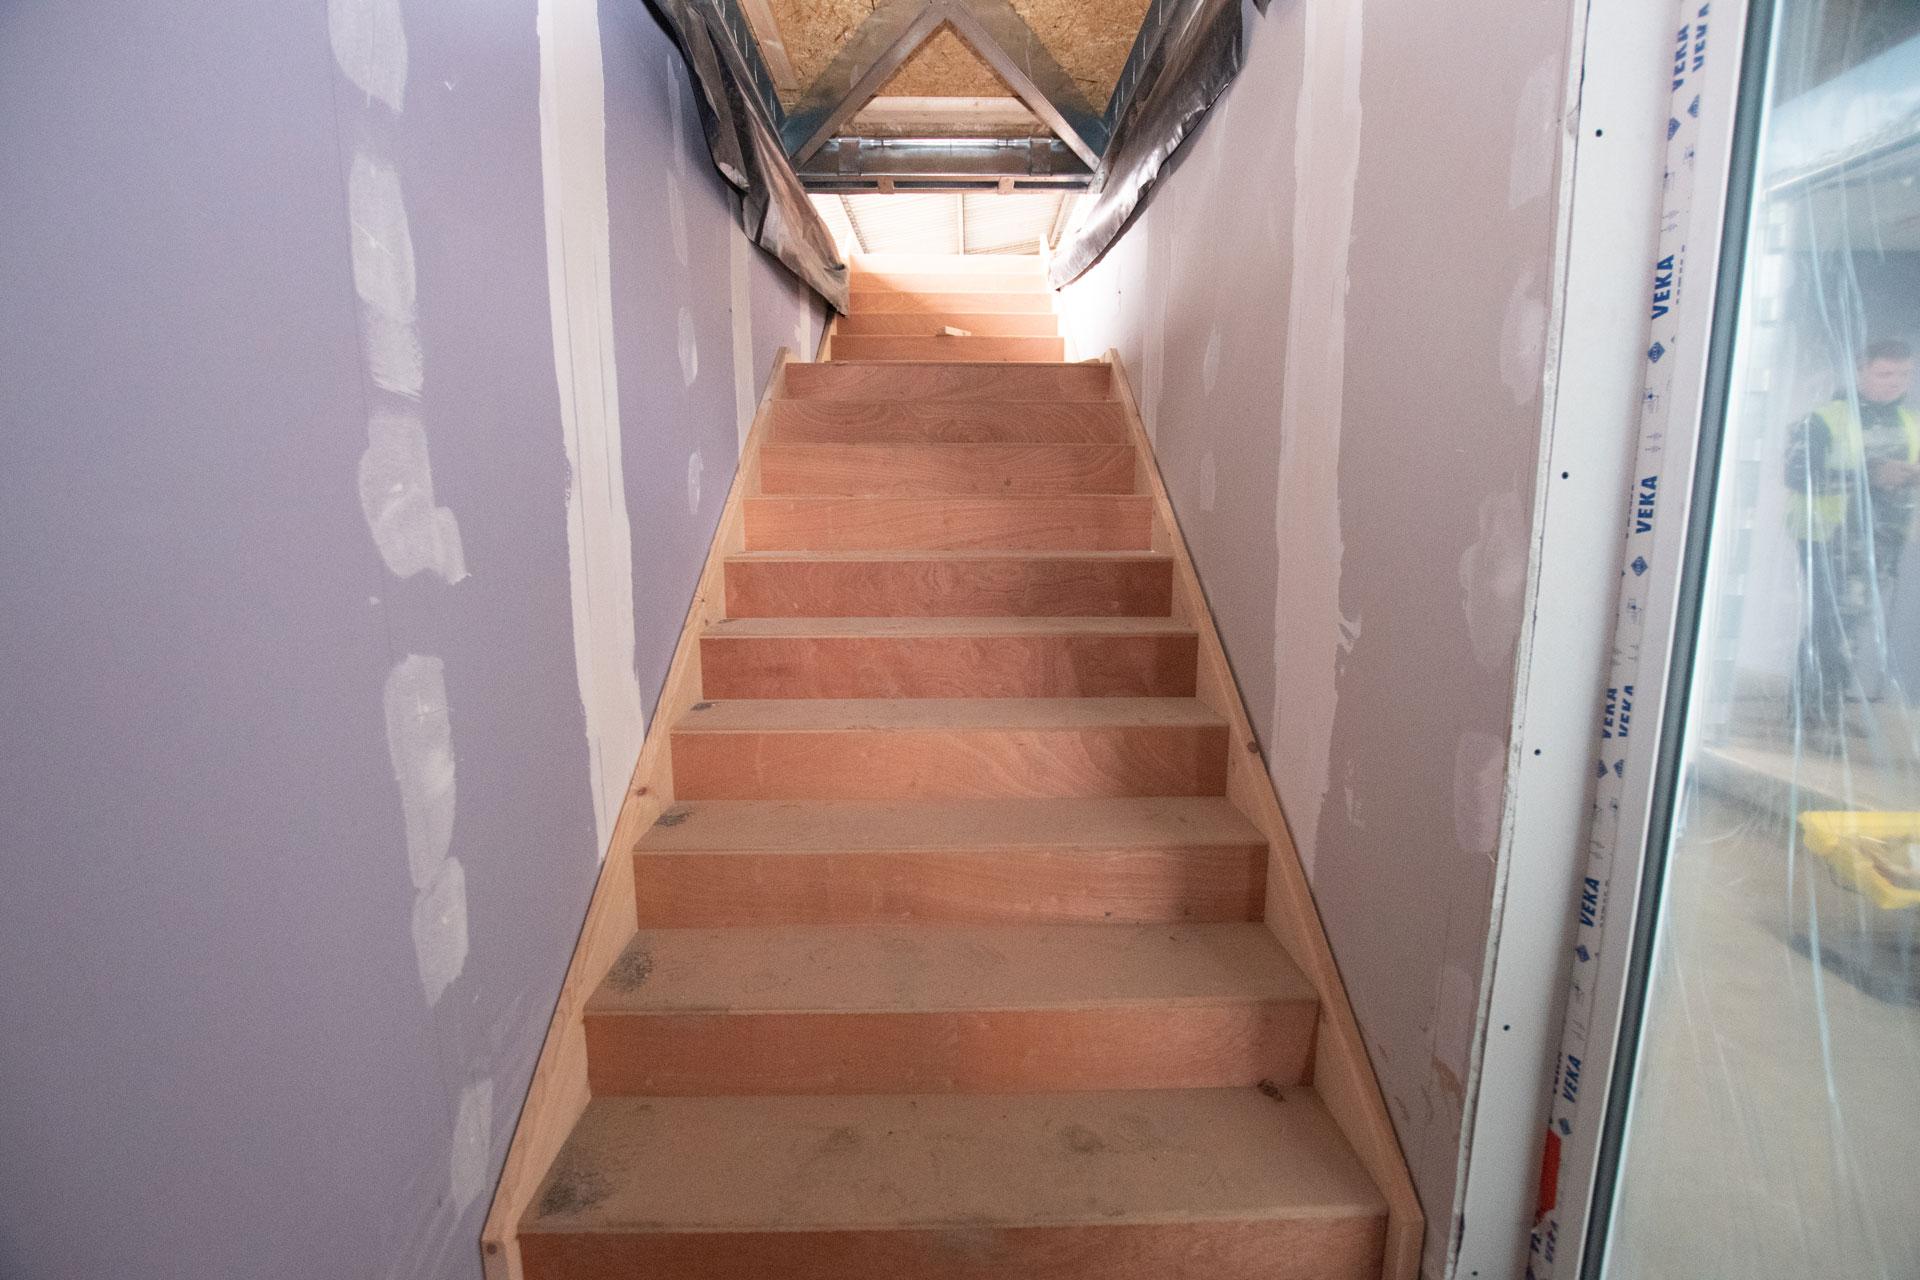 Housing 21 Retirement living modular apartments UK - Richard Onslow Court - Stairway progress